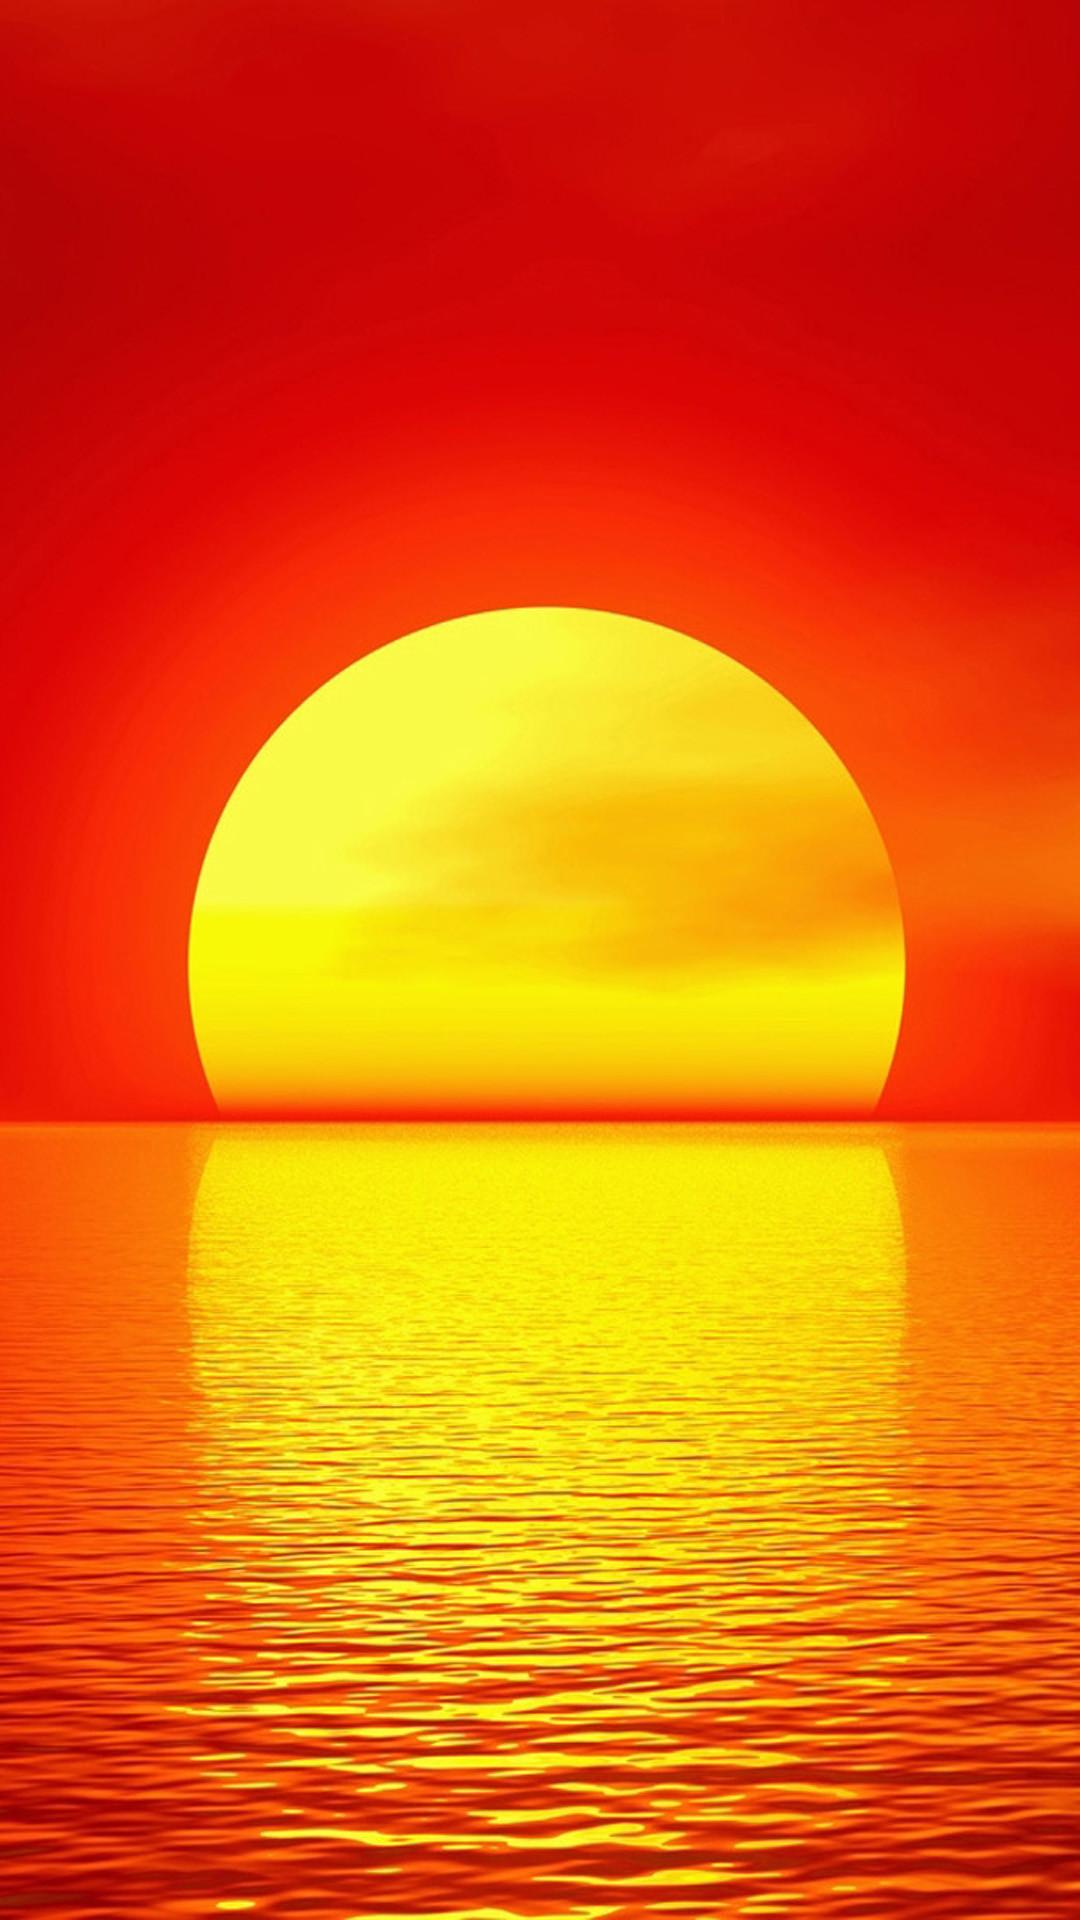 Sunset melt gold wallpaper for iphone 6 plus, iPhone 6 Plus Wallpaper